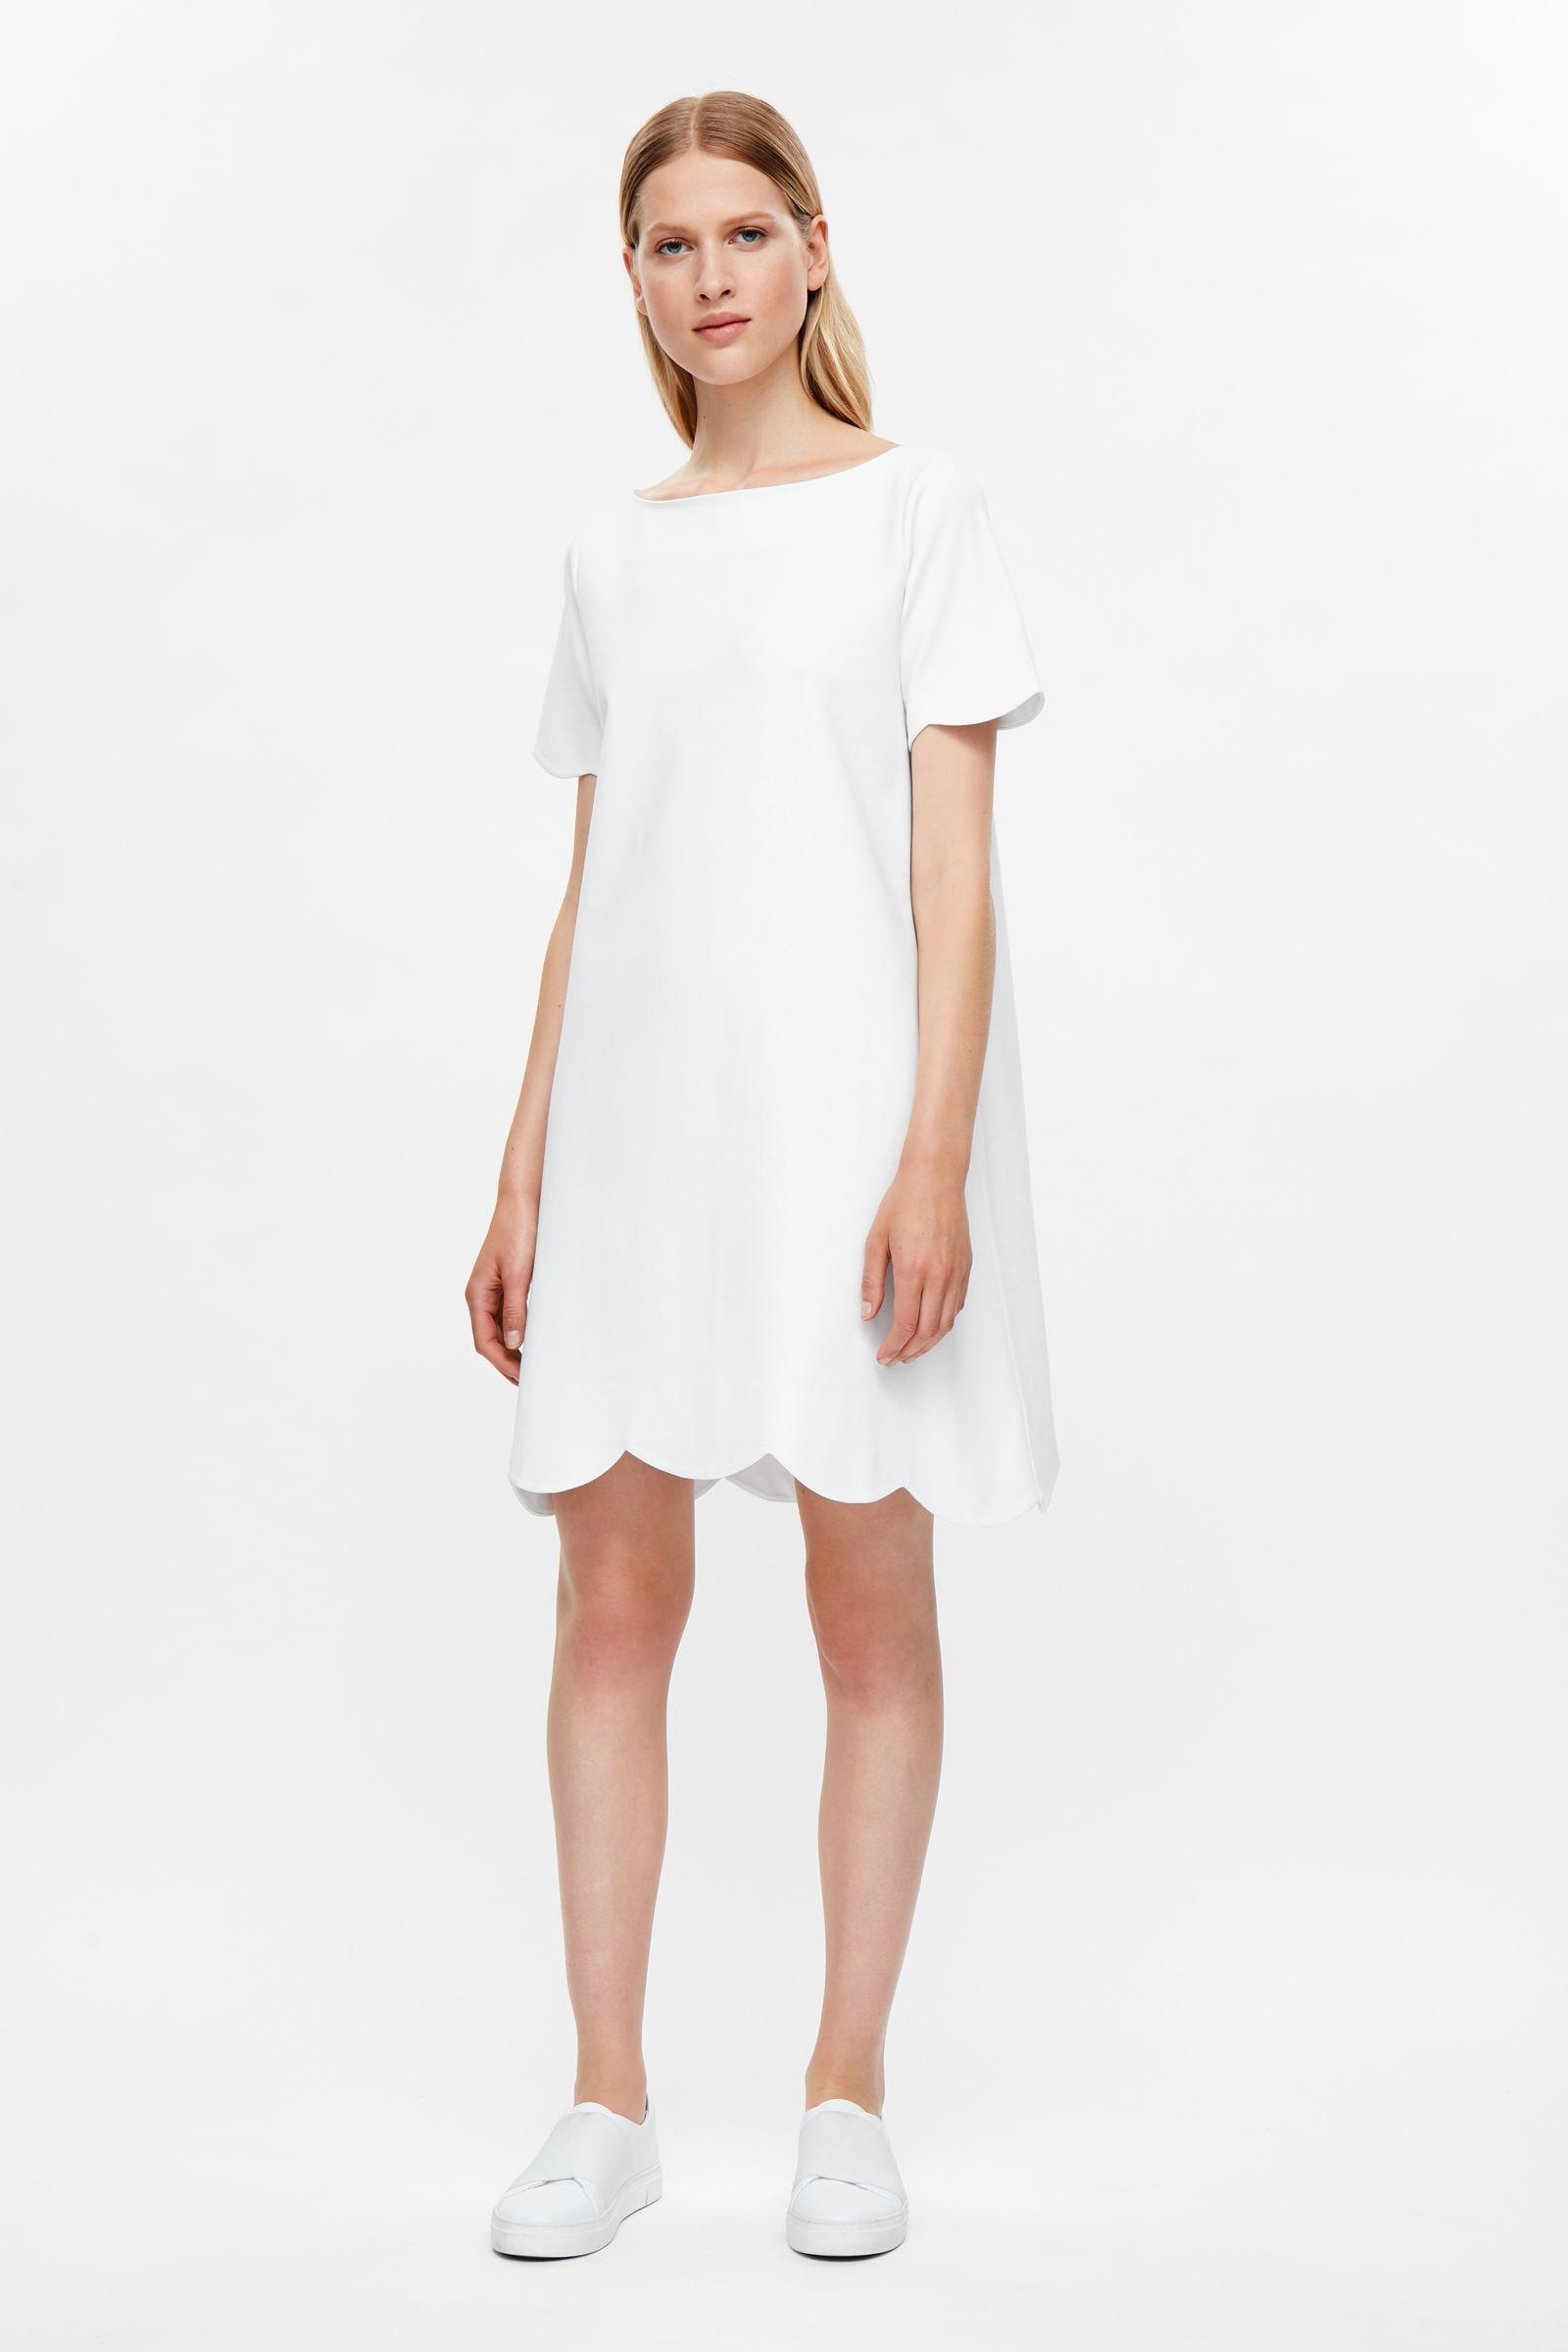 c3b3f25ea5cb COS image 1 of Scalloped edge dress in White